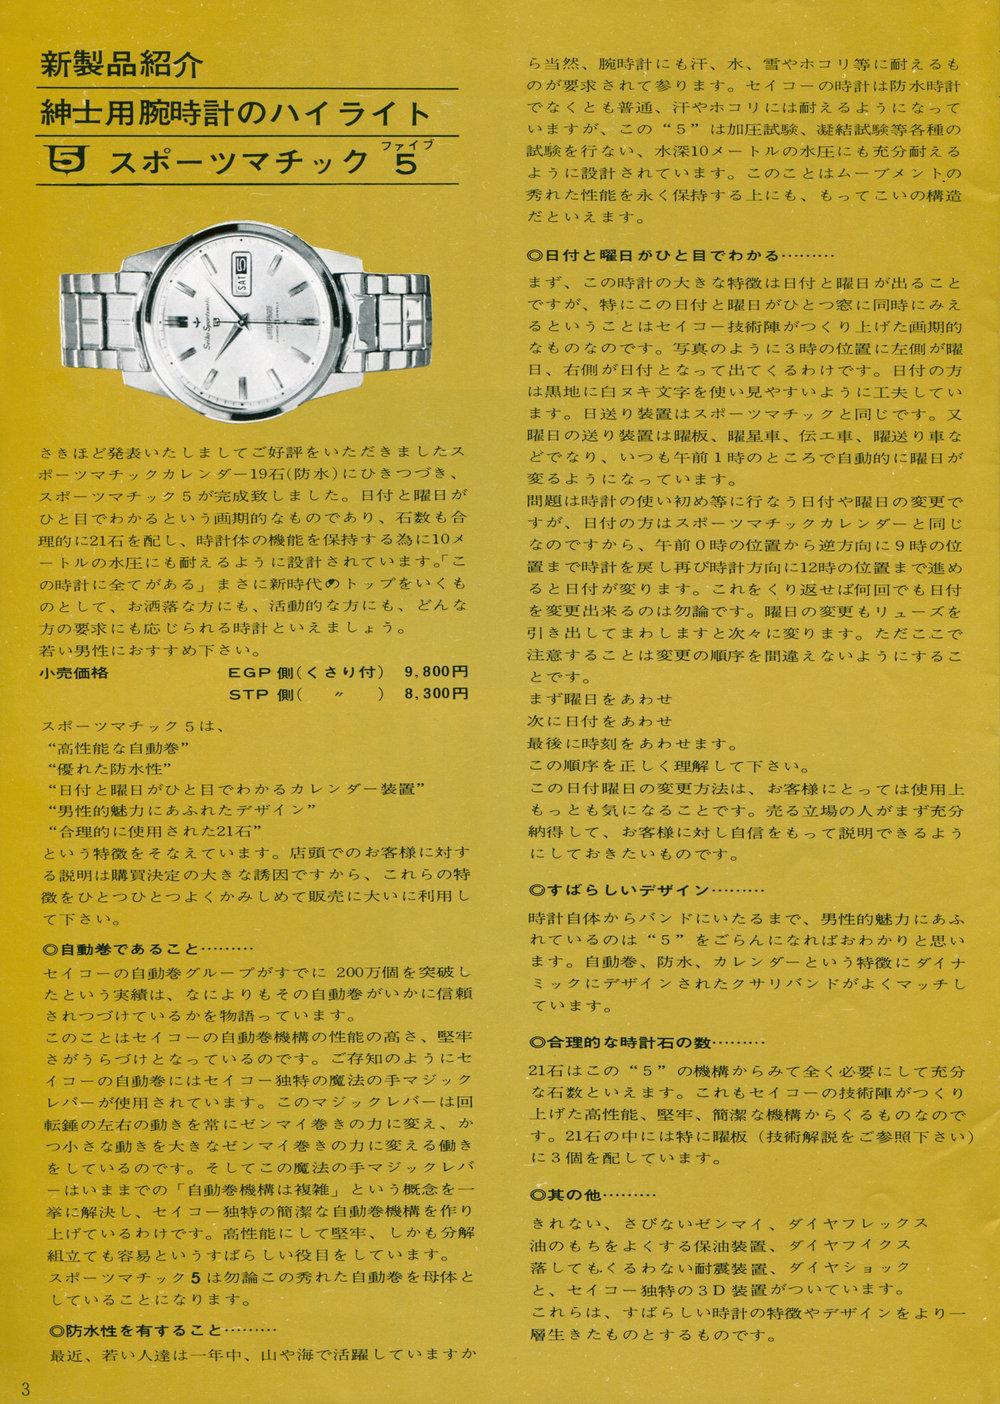 Seiko News 1963.09 p.1